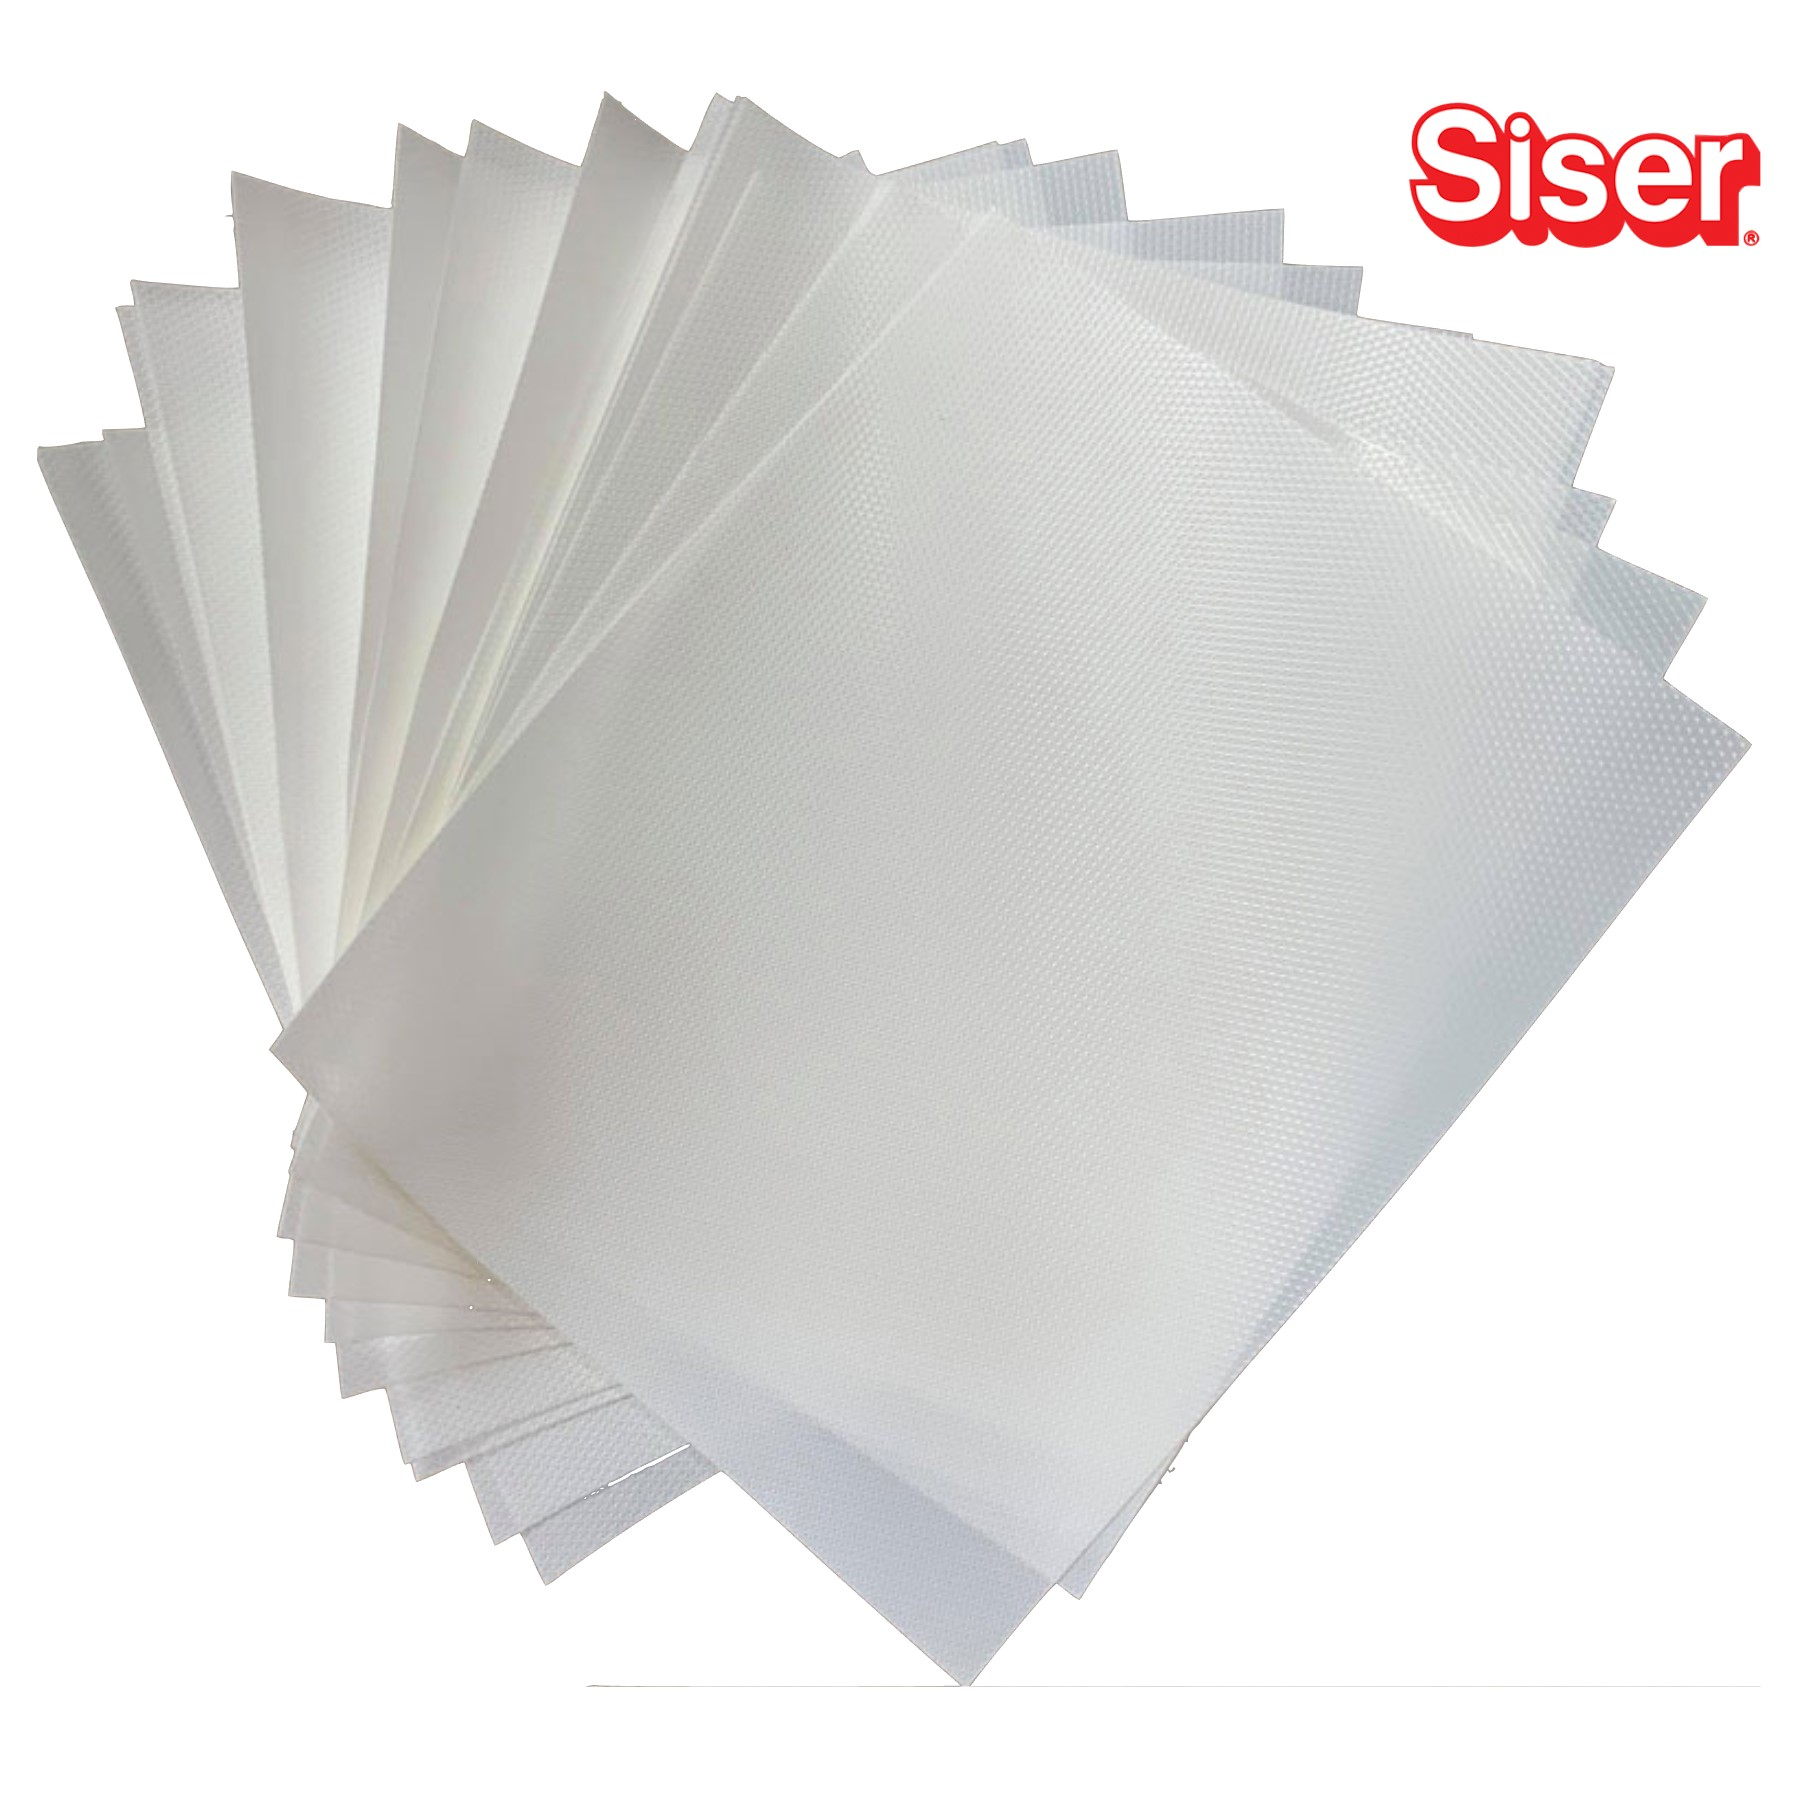 Hoja transportadora EasySubliMask®, 12 hojas